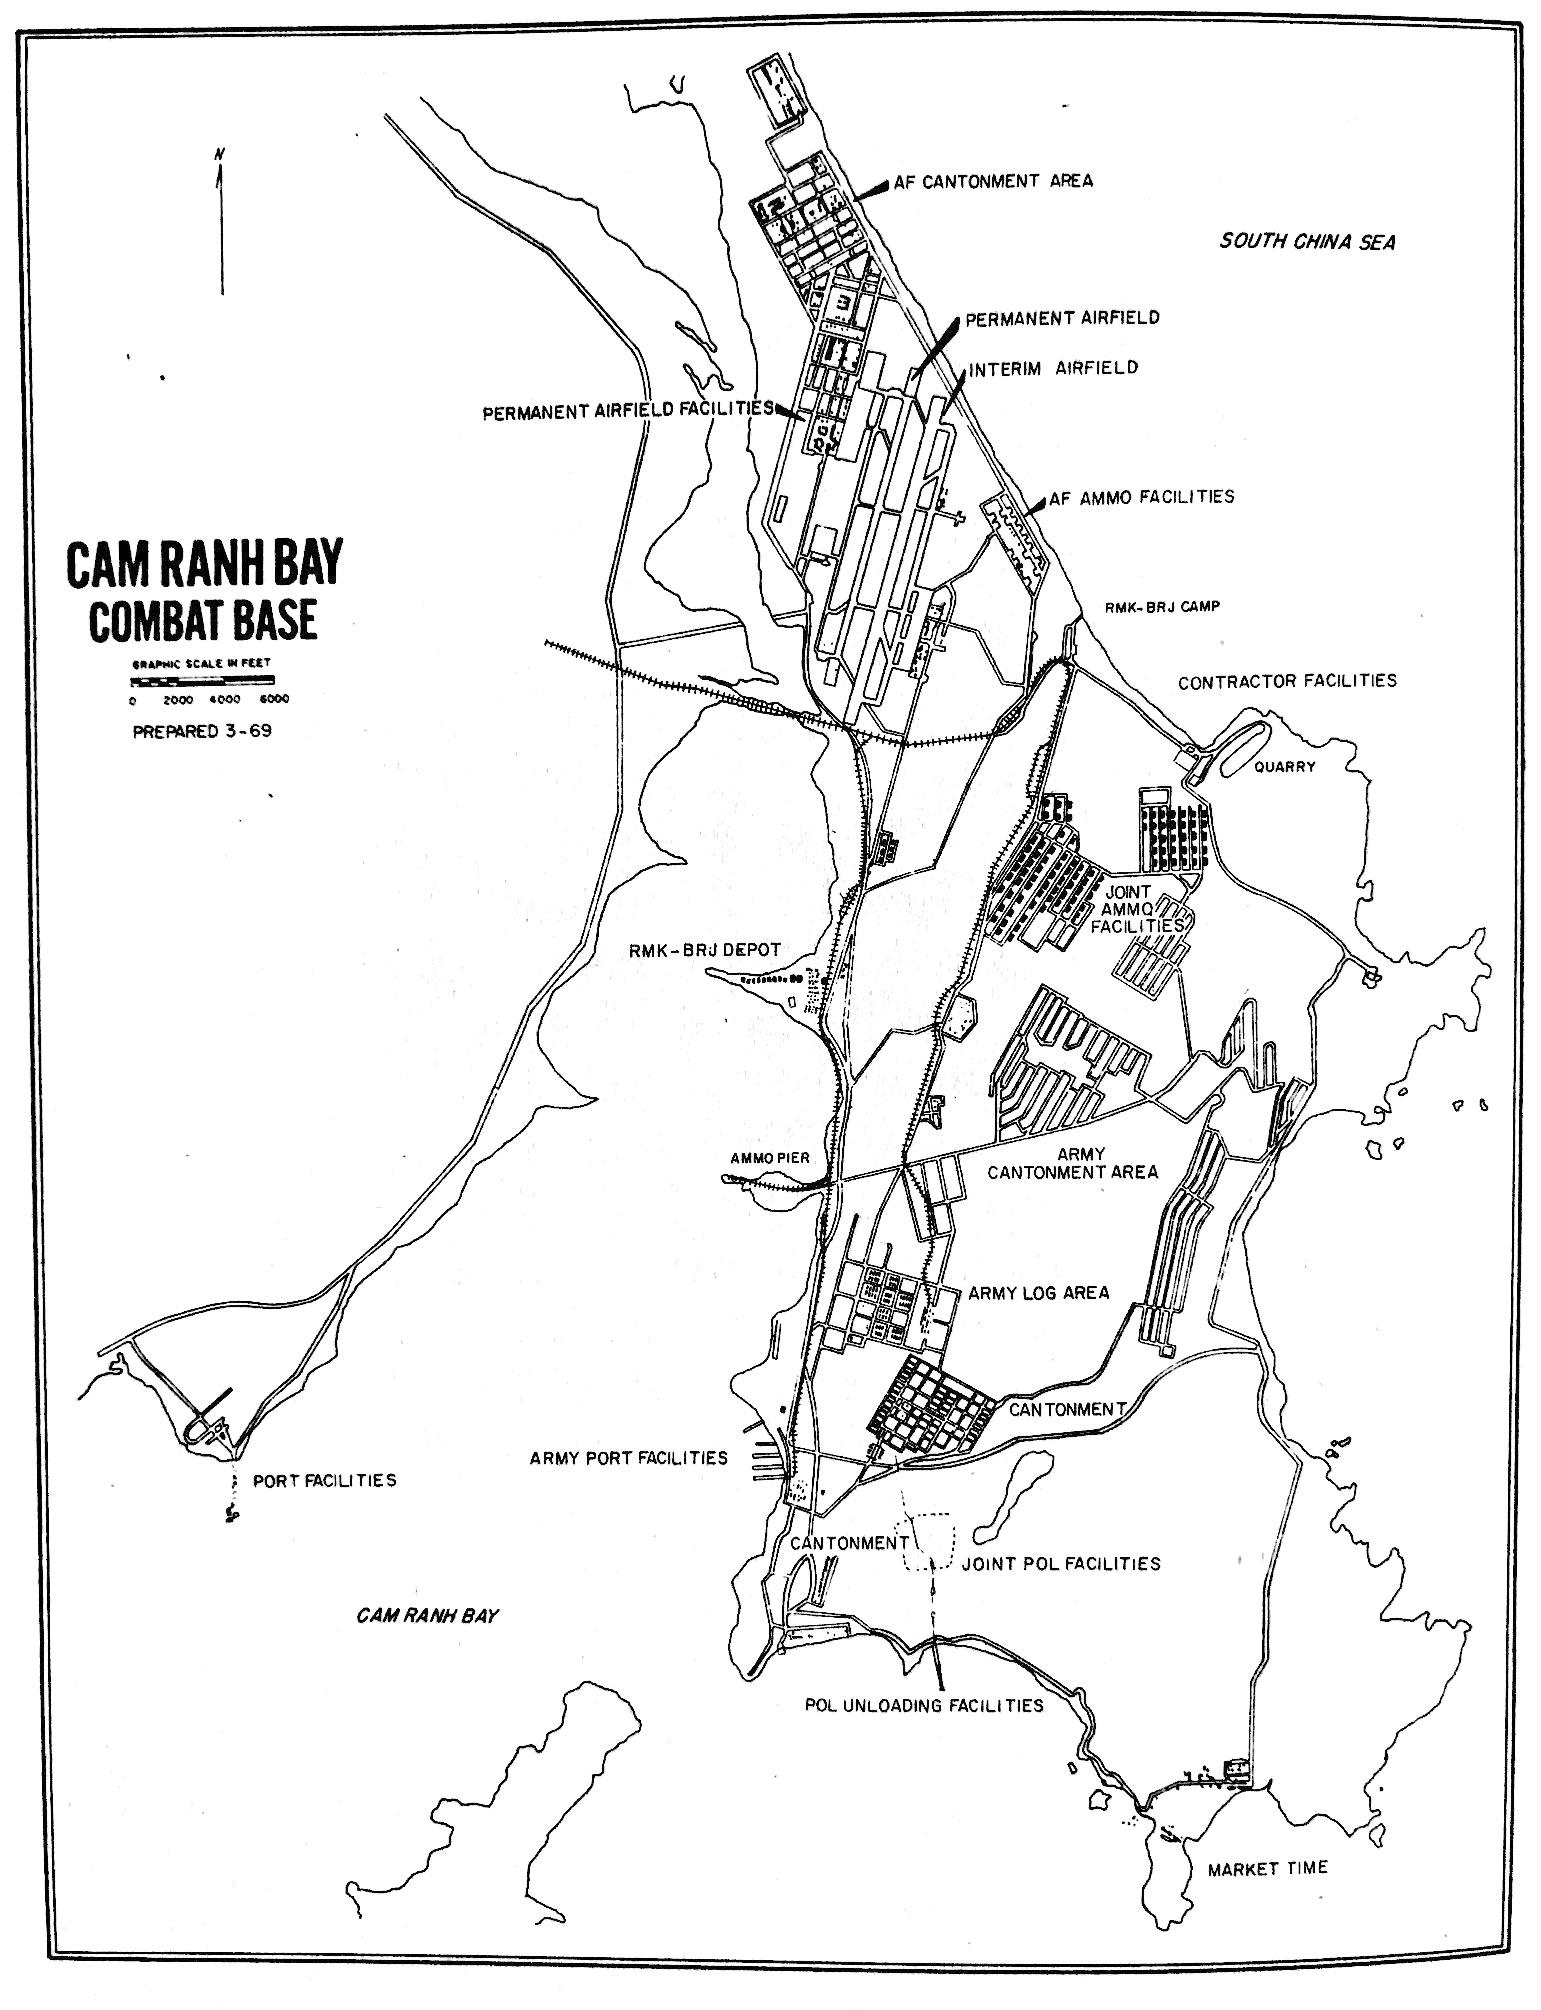 file cam ranh bay map 1969 wikimedia mons Logitech Web Camera file cam ranh bay map 1969